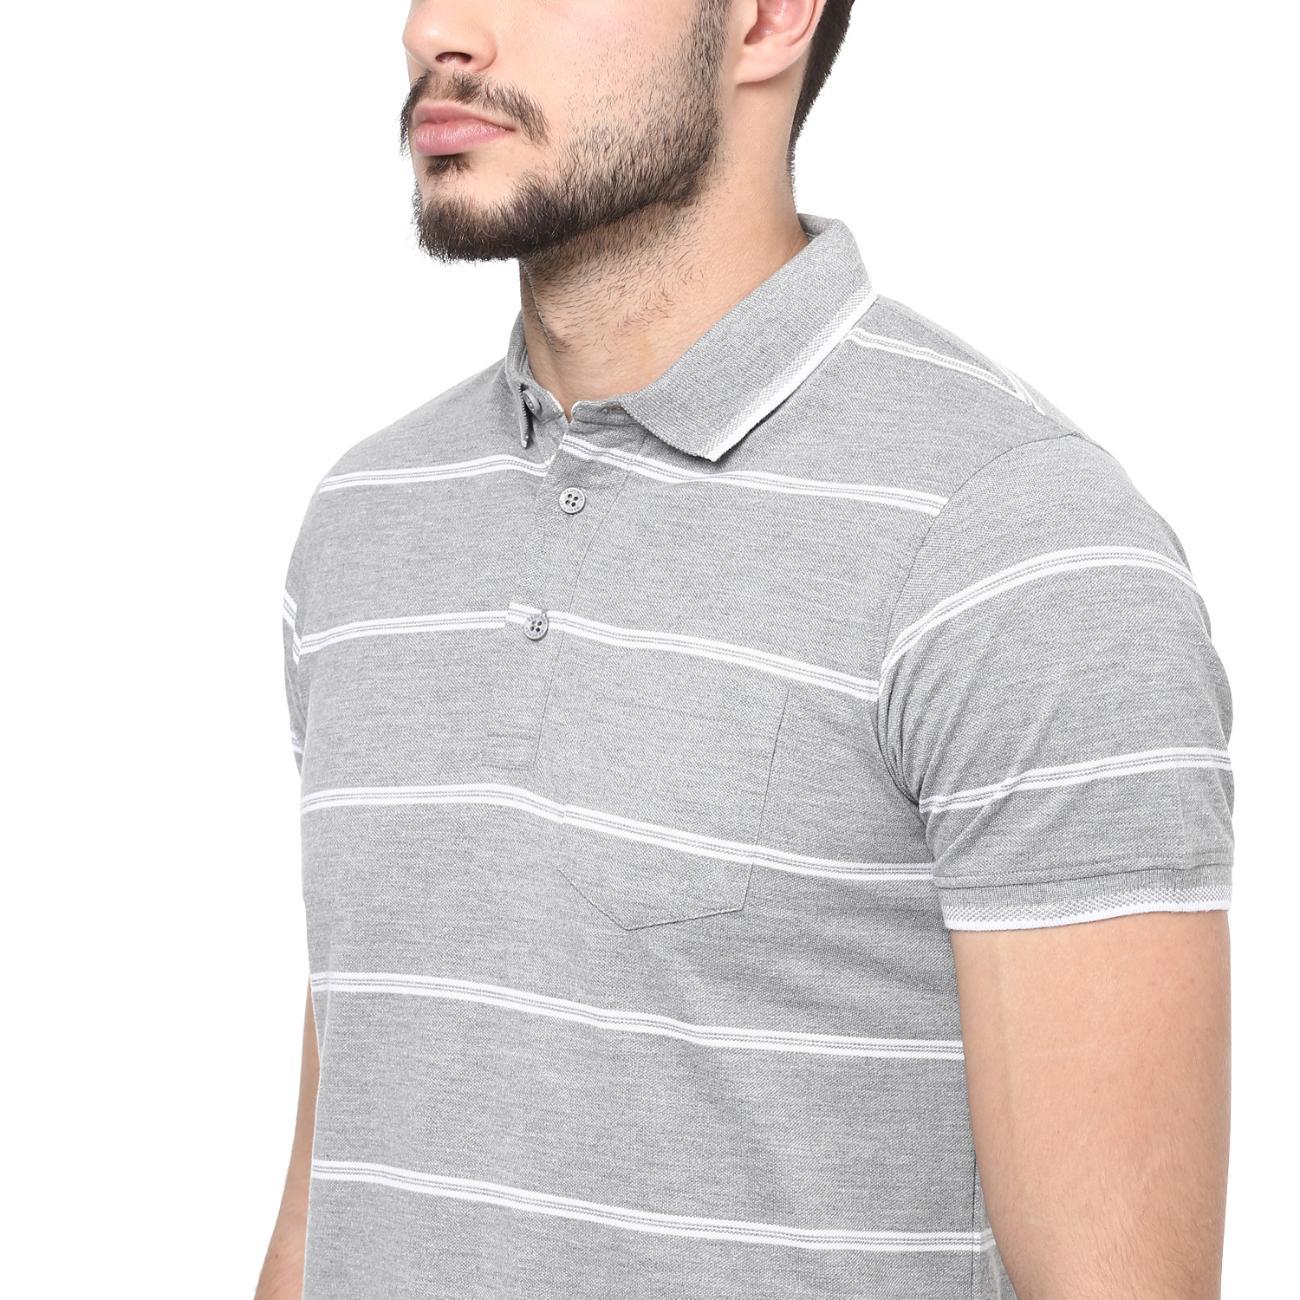 Comfortable TShirts for Men